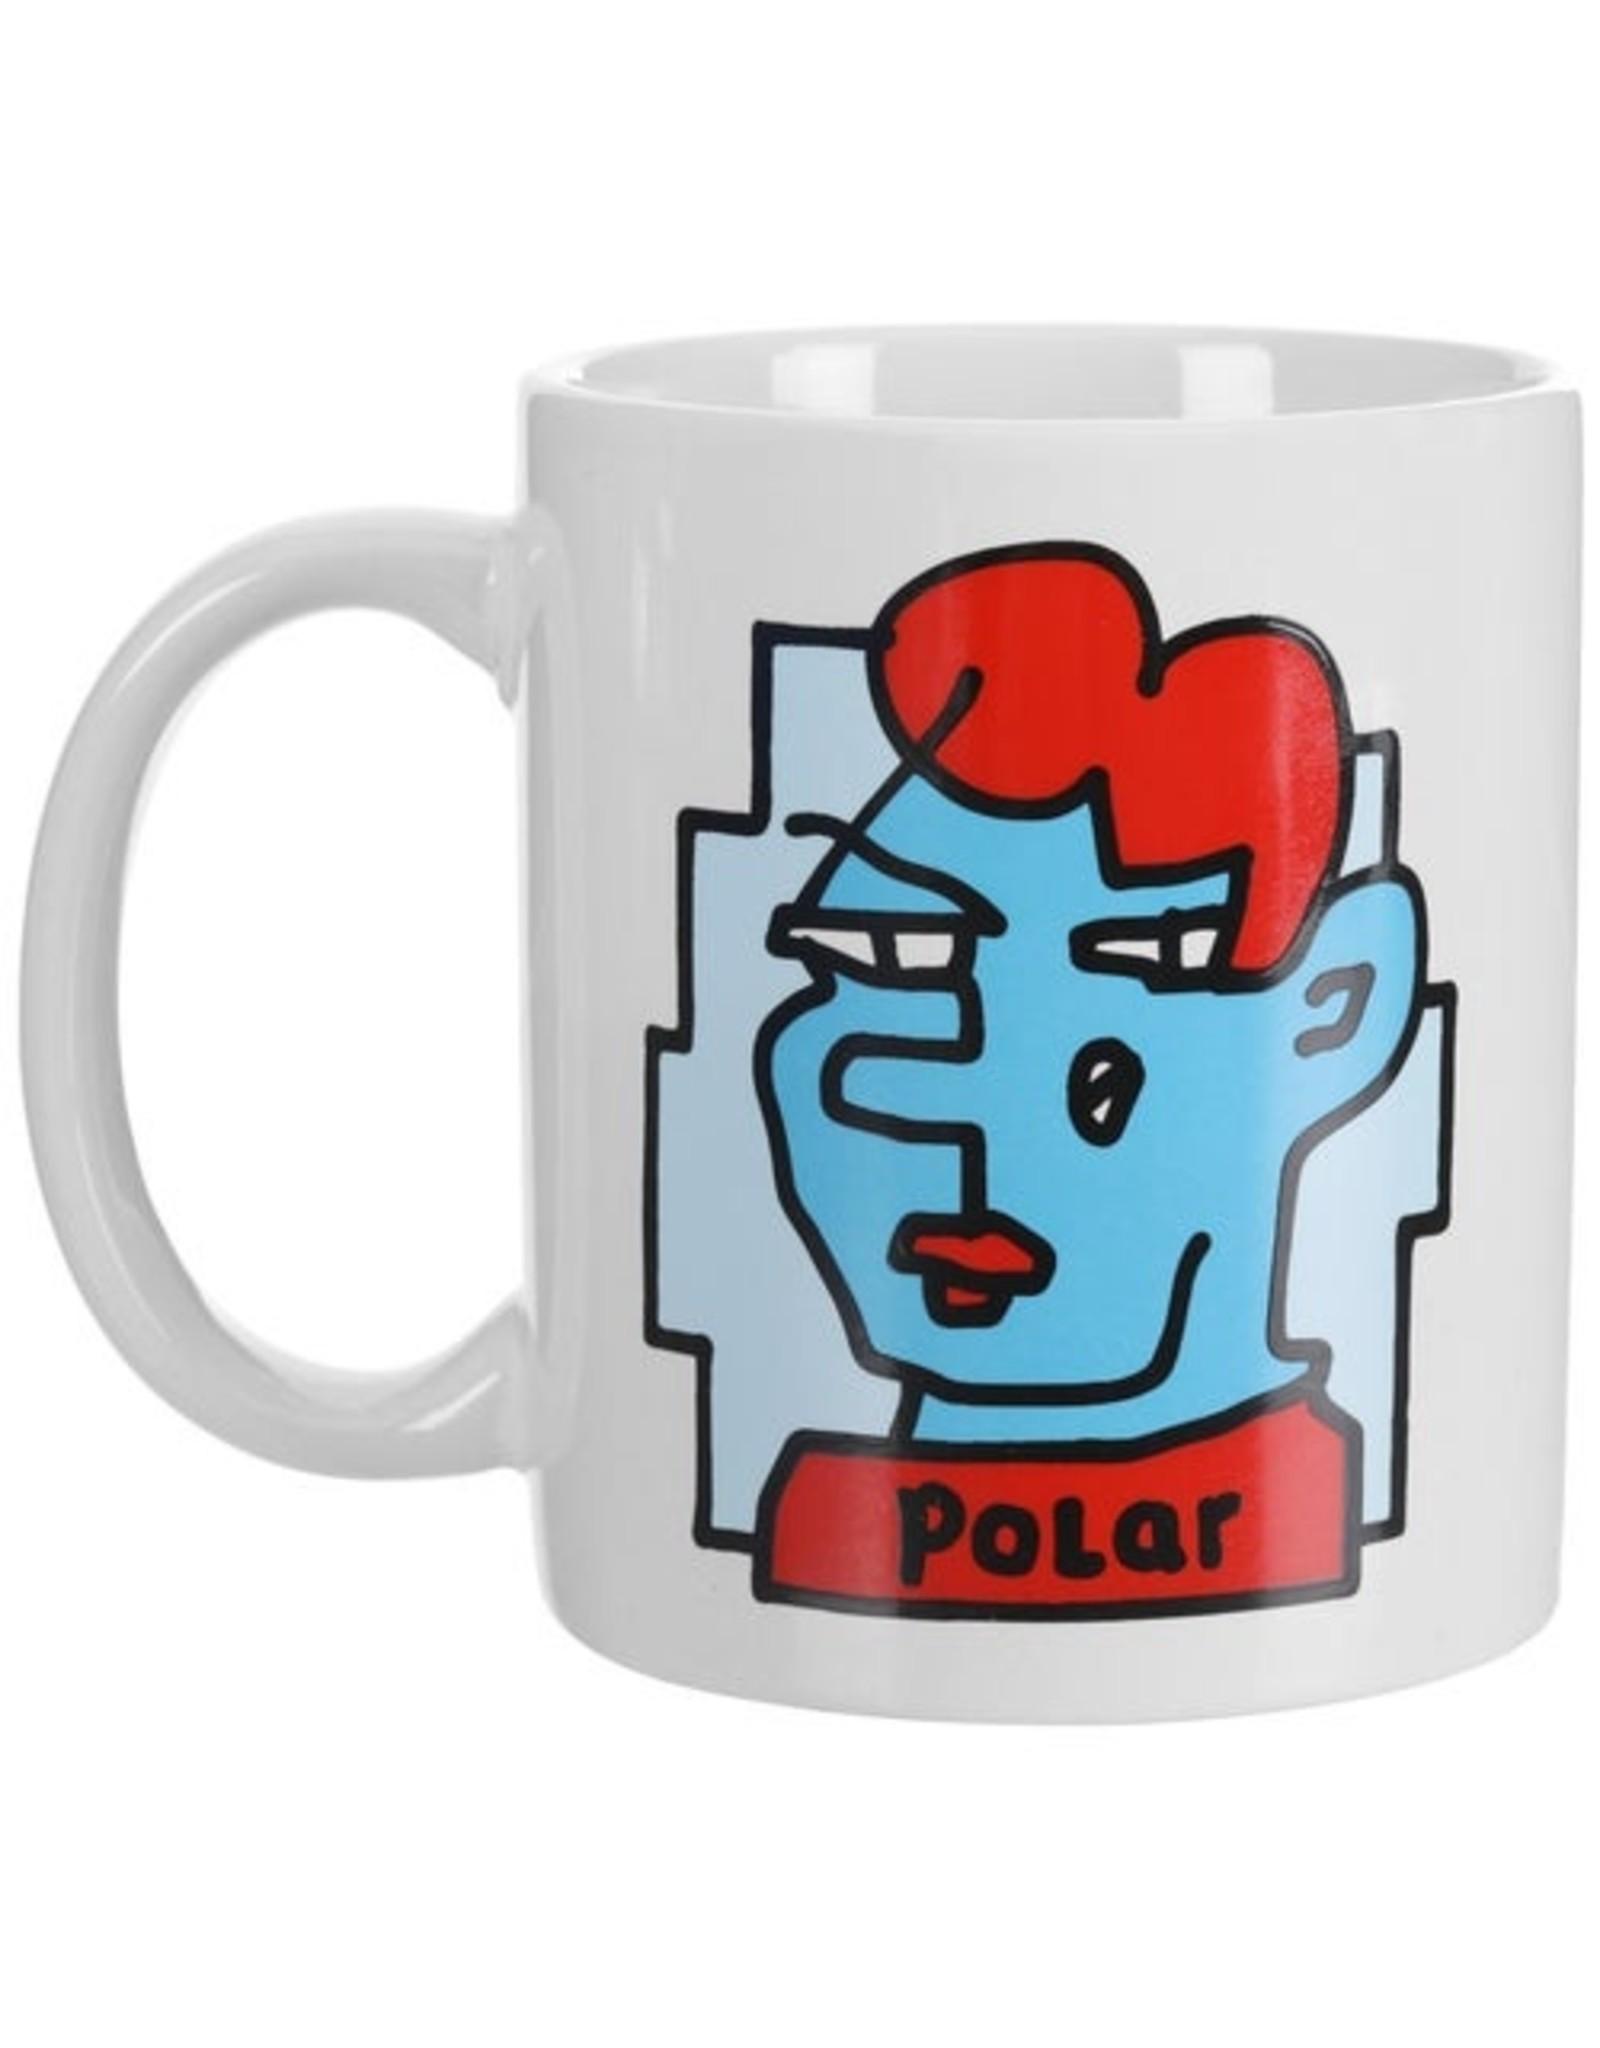 POLAR DOODLE FACE COFFEE MUG